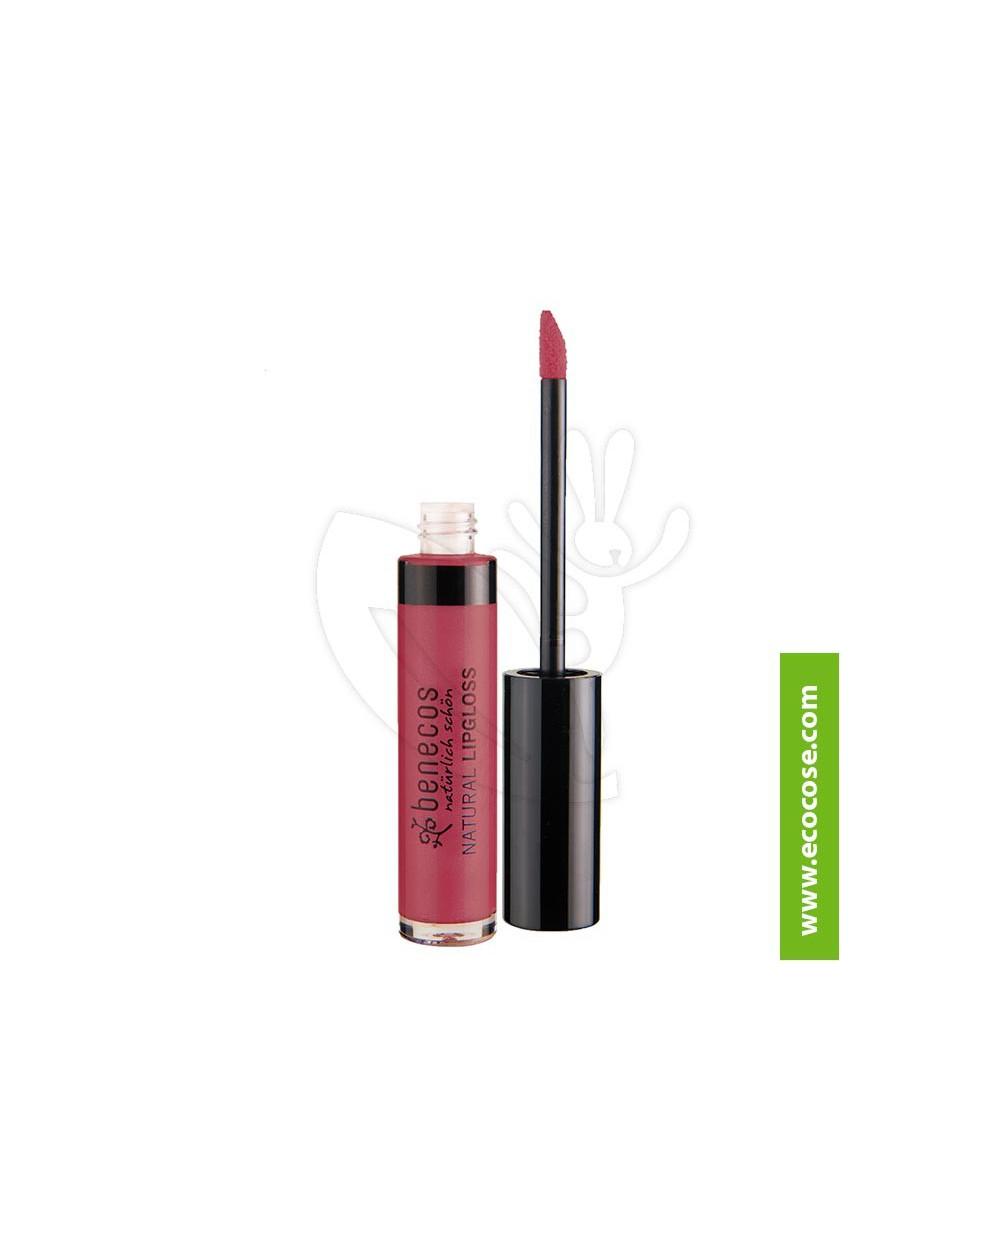 Benecos Lucidalabbra Naturale - Pink Blossom - *NEW*